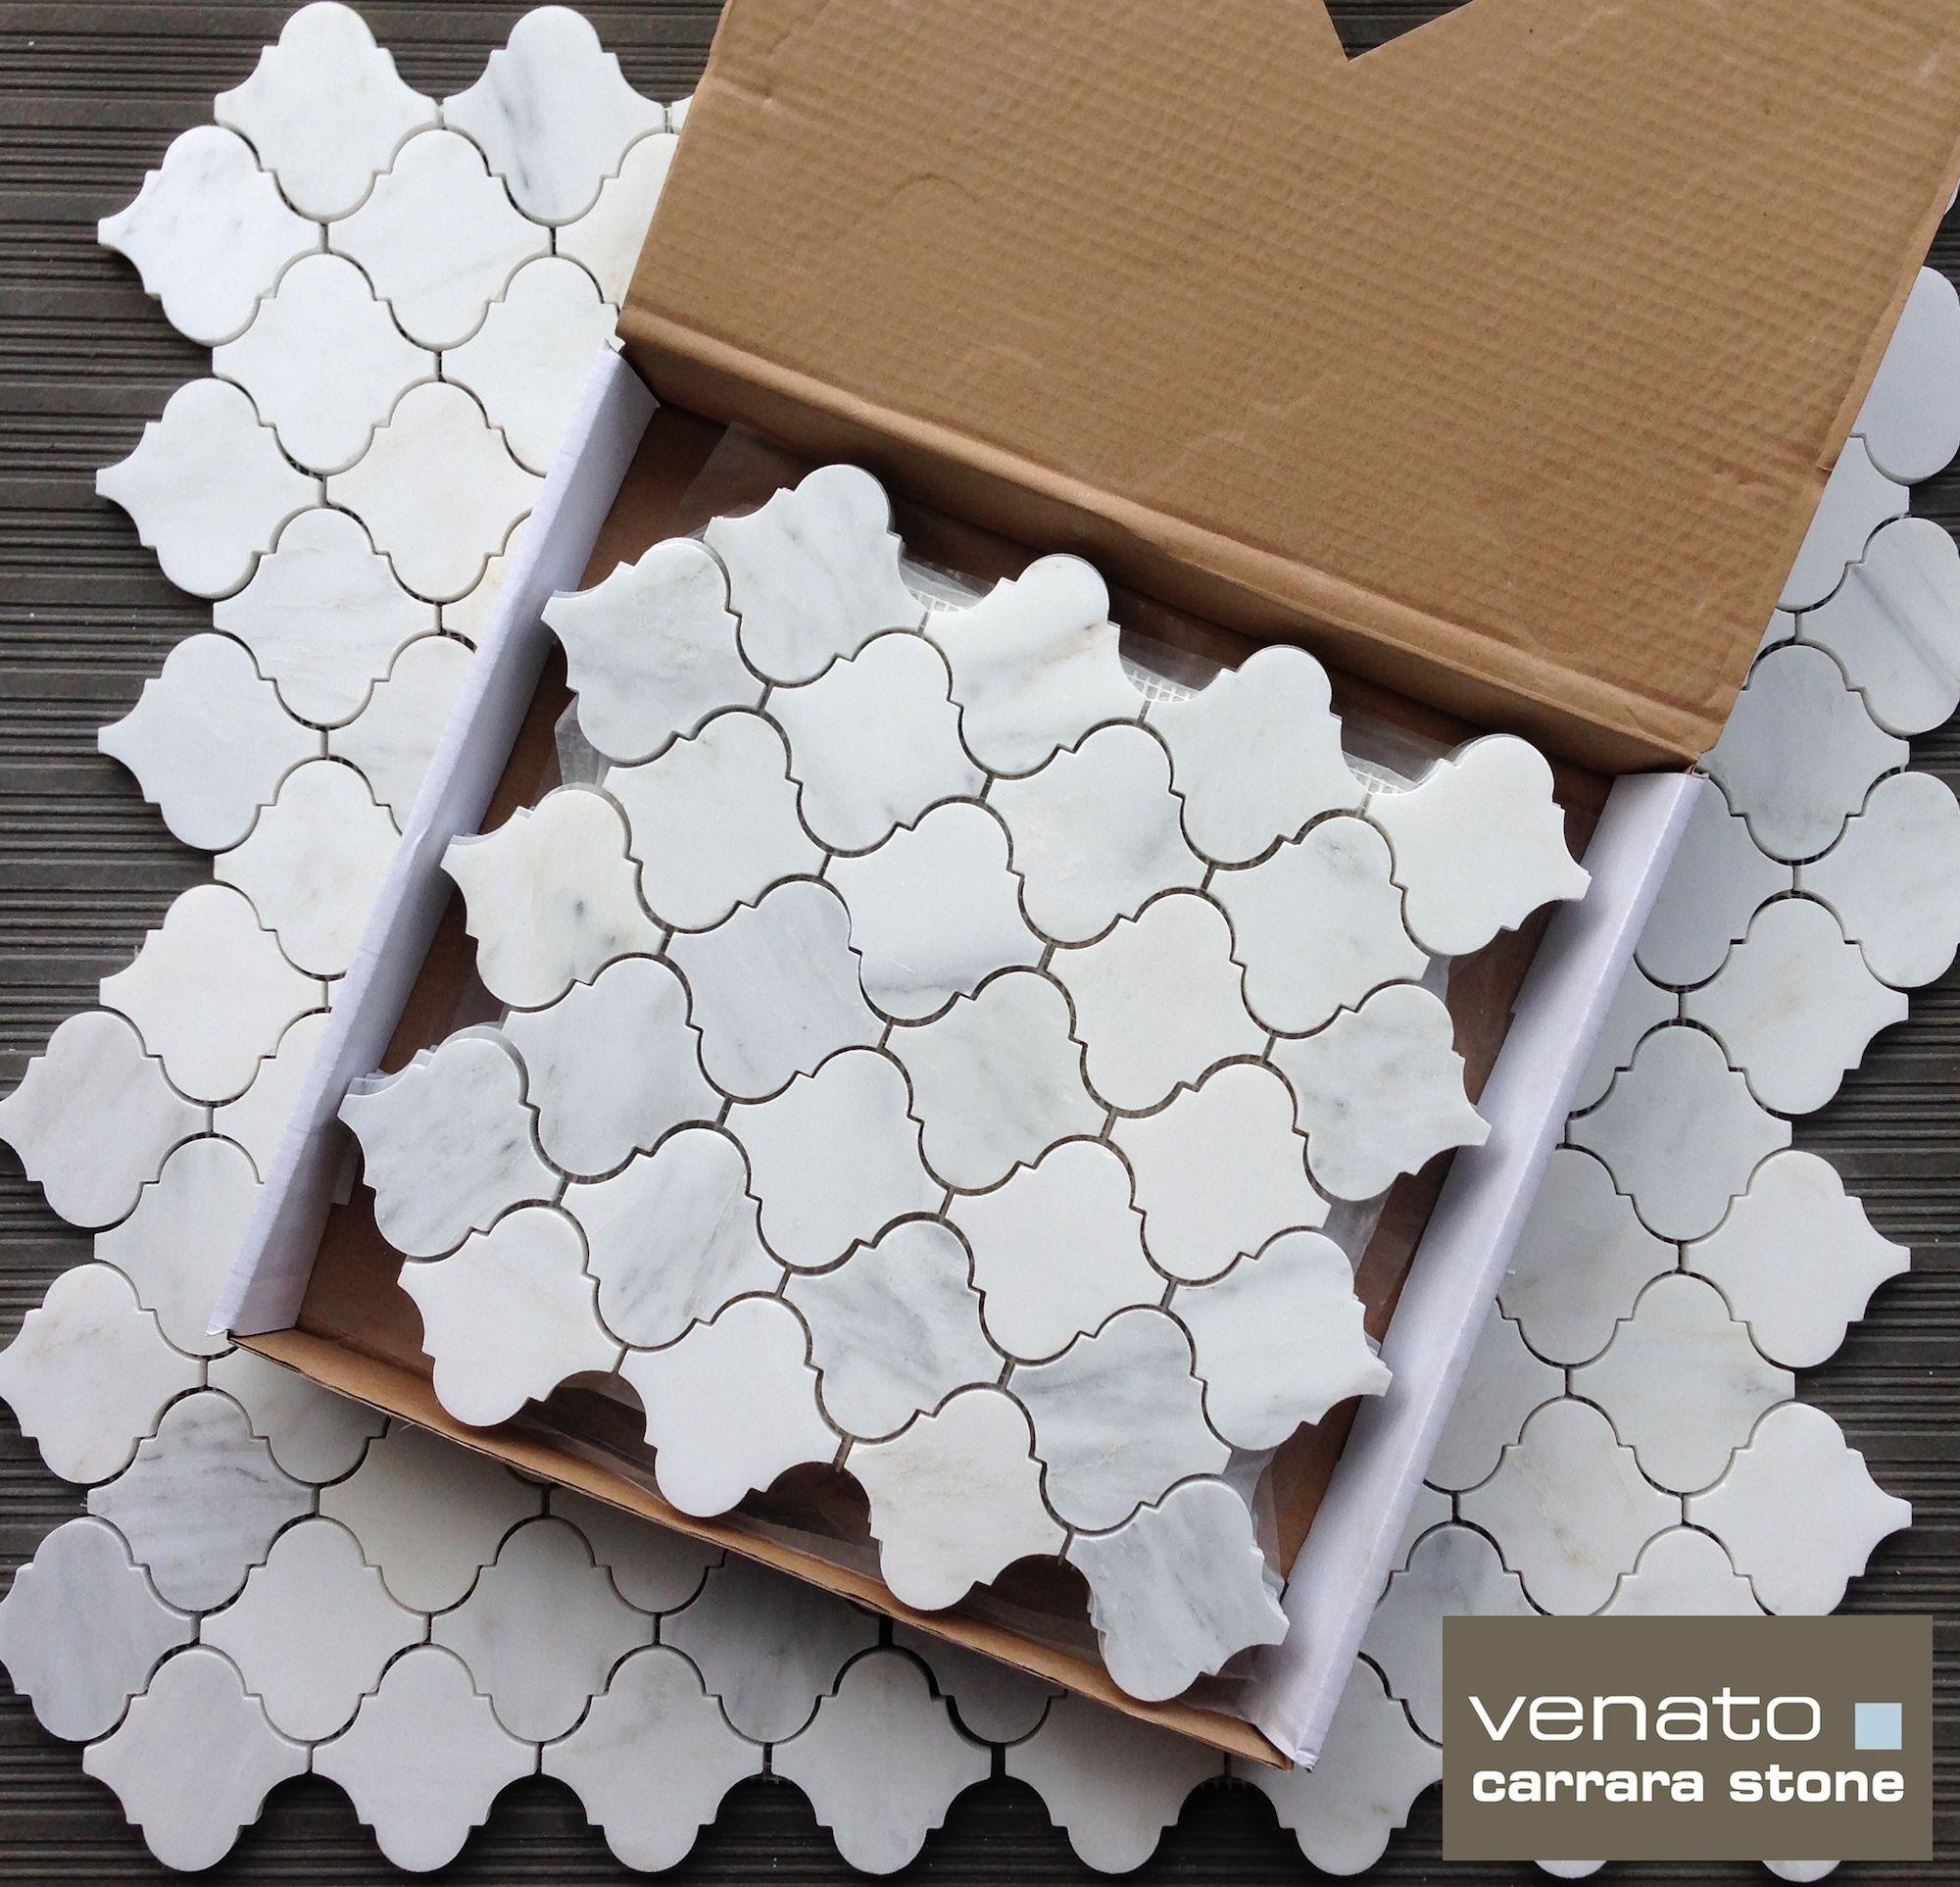 Carrara Marble Arabesque Tile The Builder Depot Blog